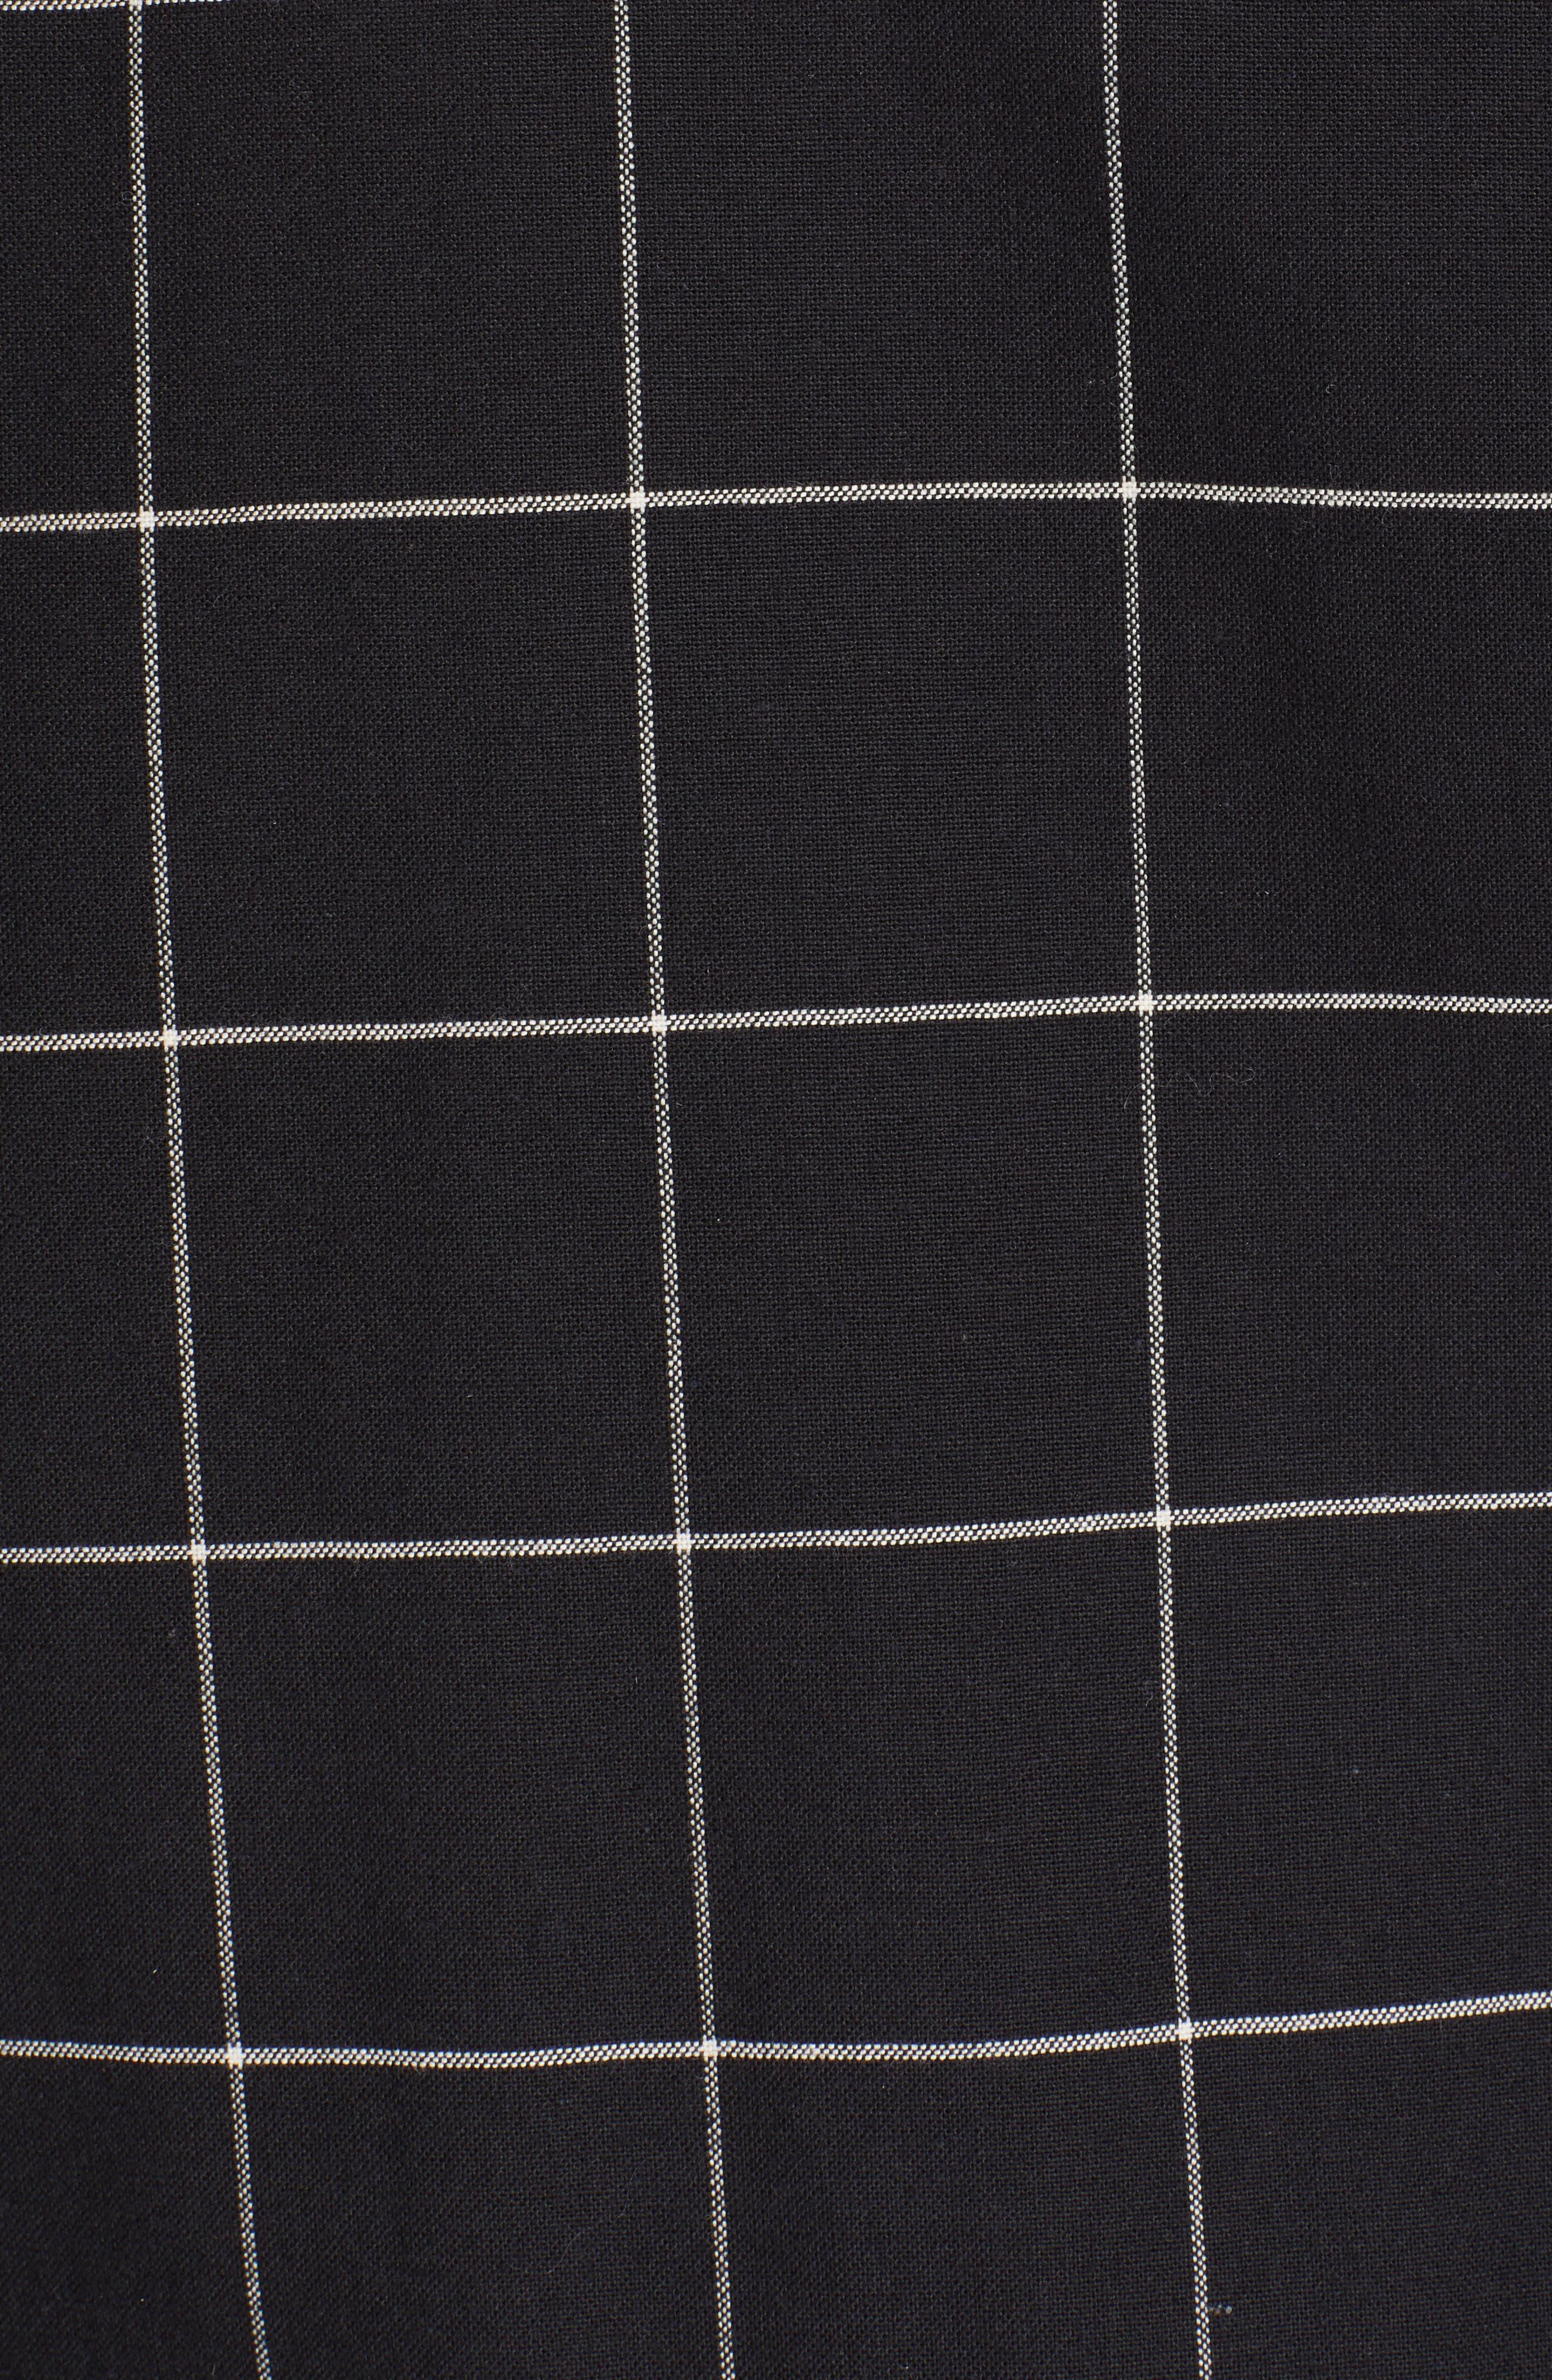 PS PAUL SMITH, Grid Wool Blend Bomber Jacket, Alternate thumbnail 6, color, BLACK